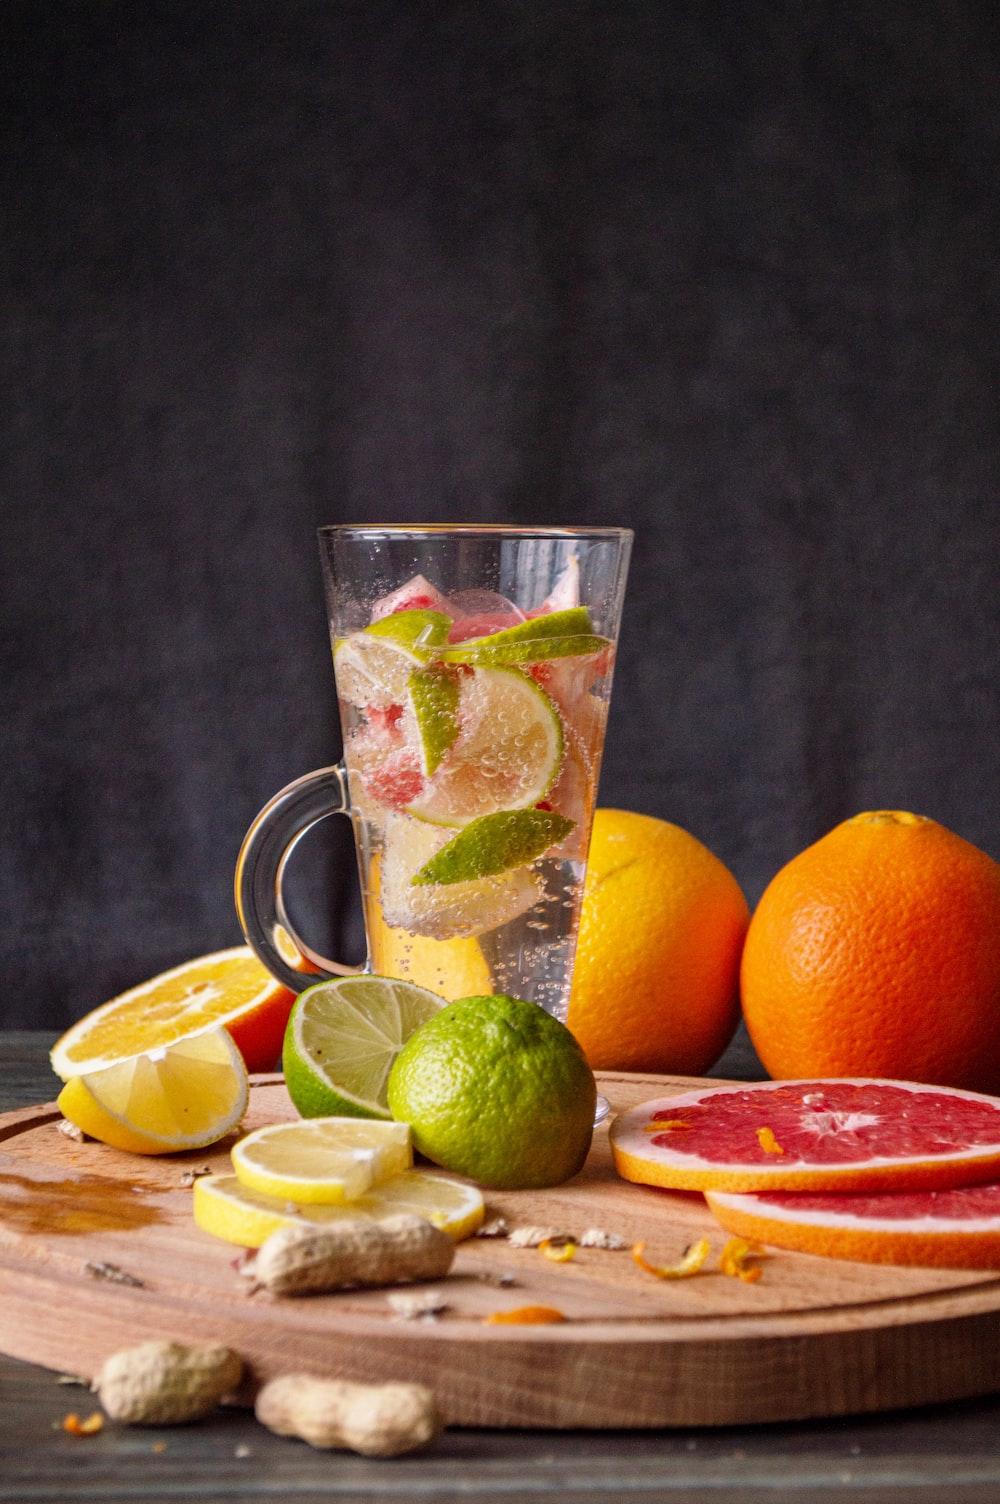 clear glass mug with orange fruits